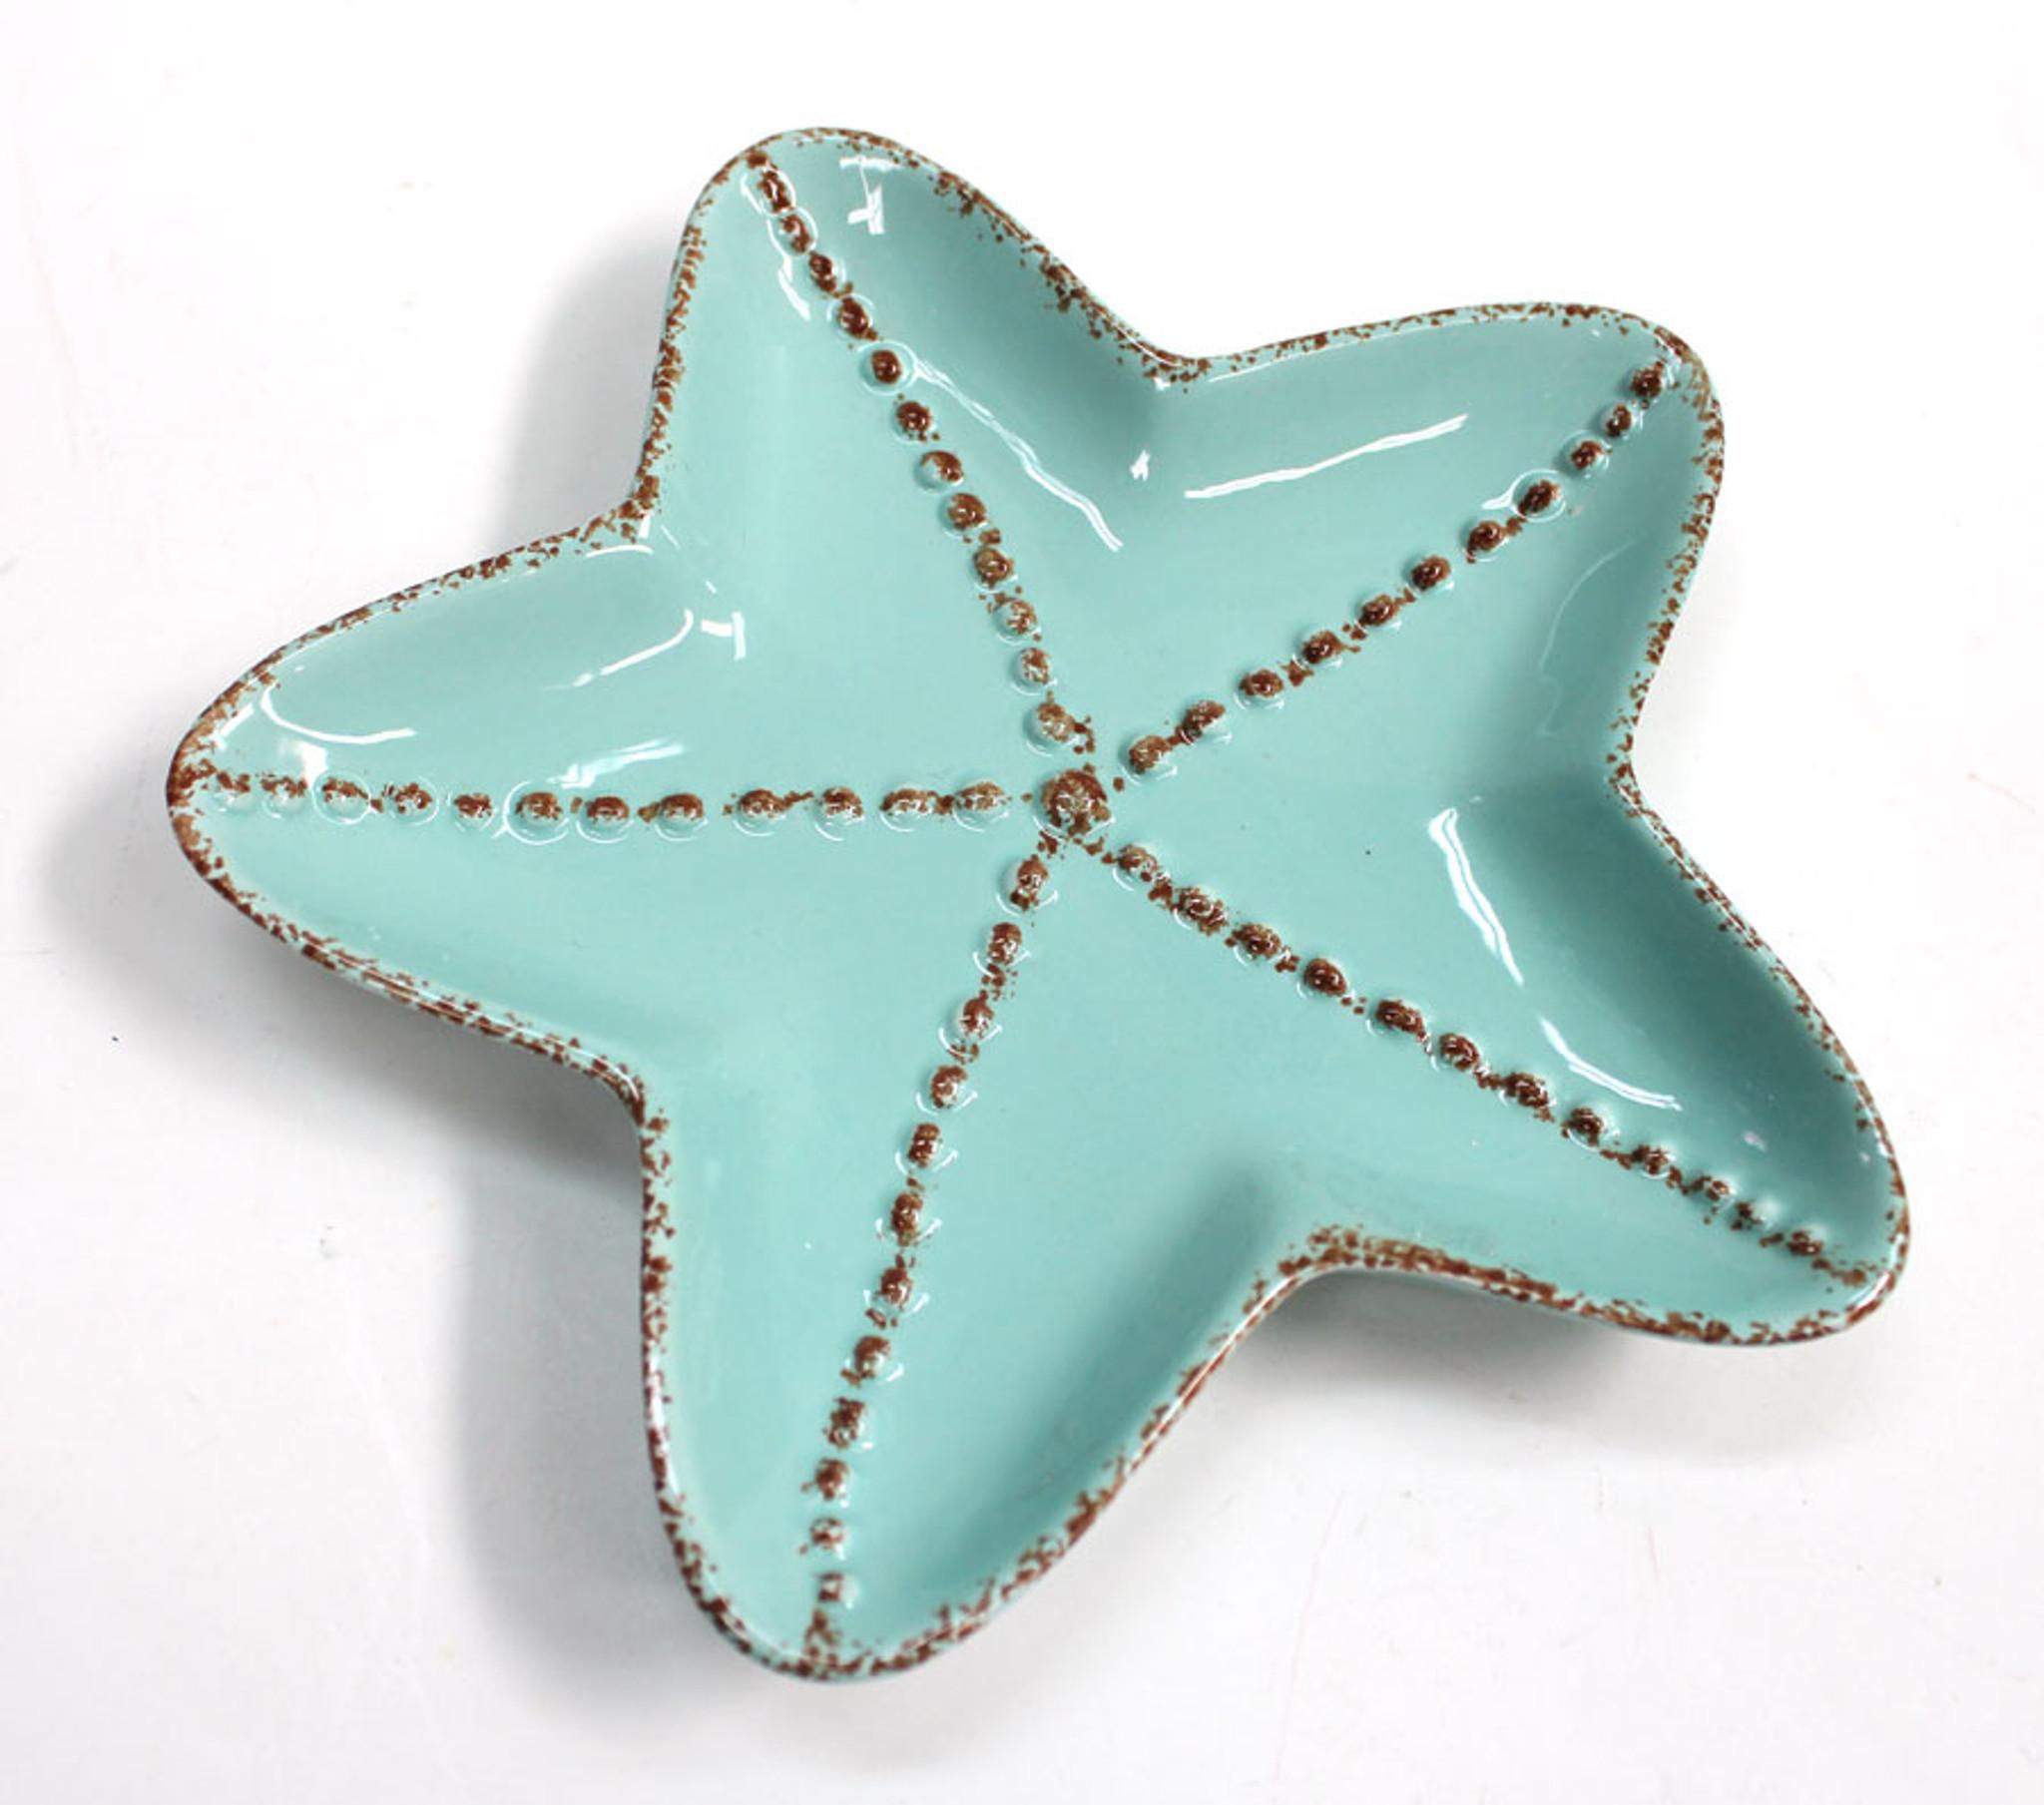 Ceramic Starfish Plate Coastal Appetizer Or Salad Plate